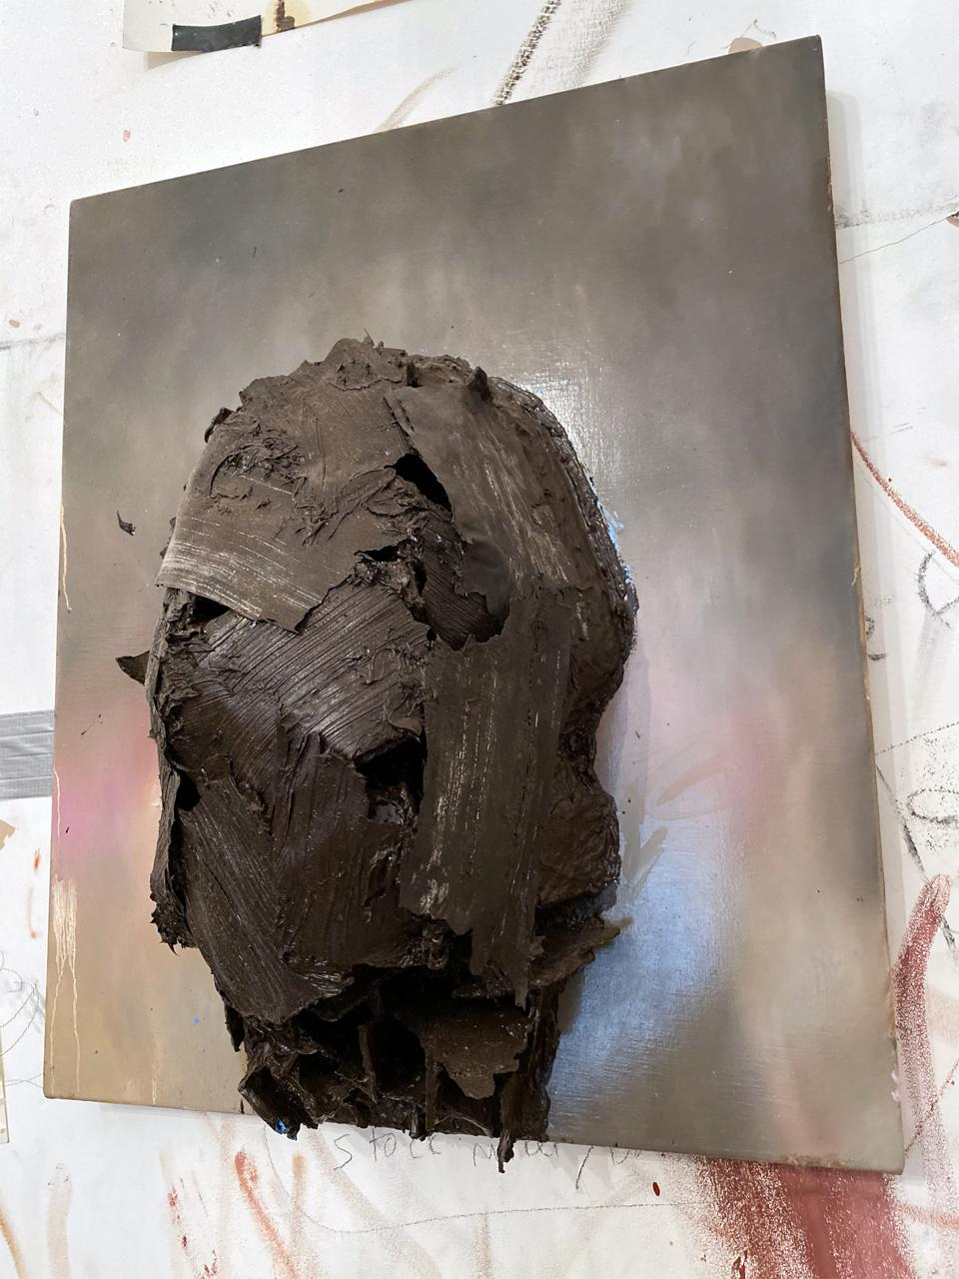 'Constructing Auras' by Antony Micallef